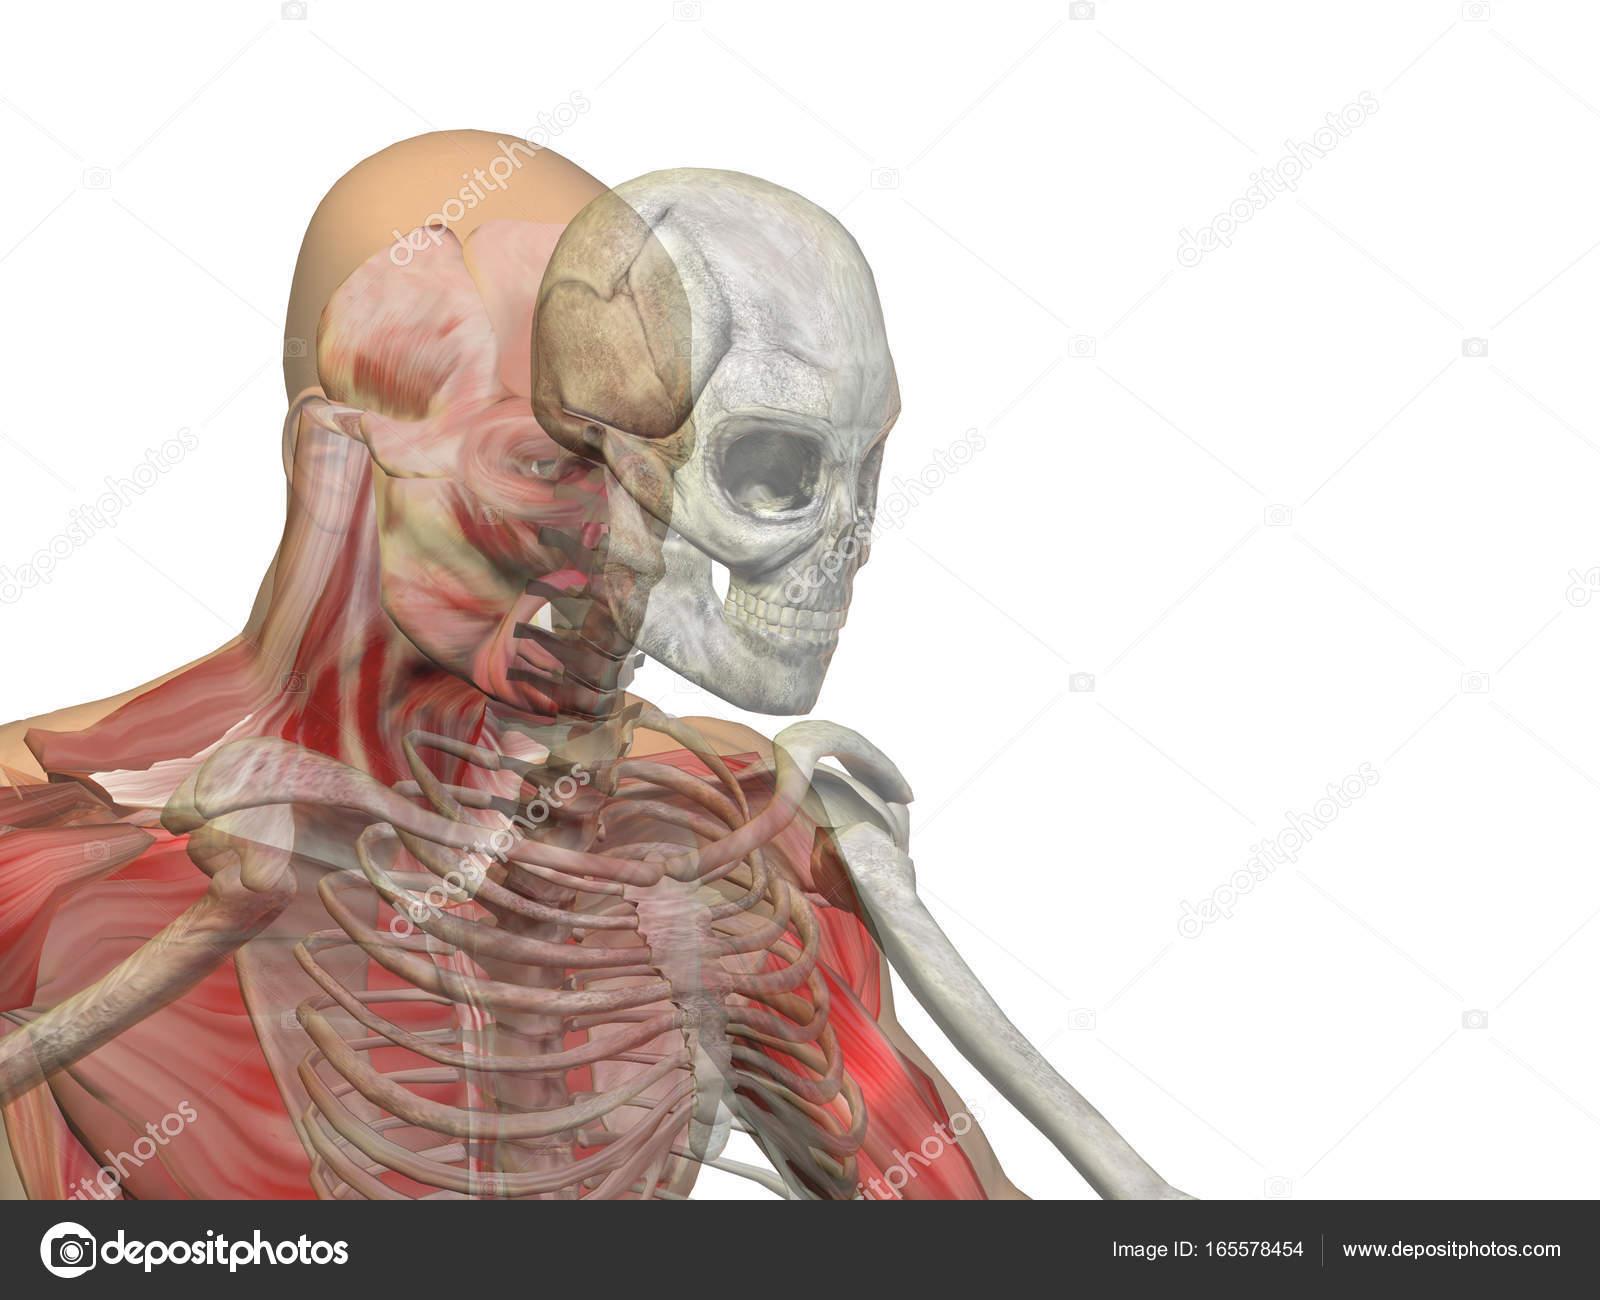 Anatomy Concept 3d Illustration Of Human Man Medical Health Body